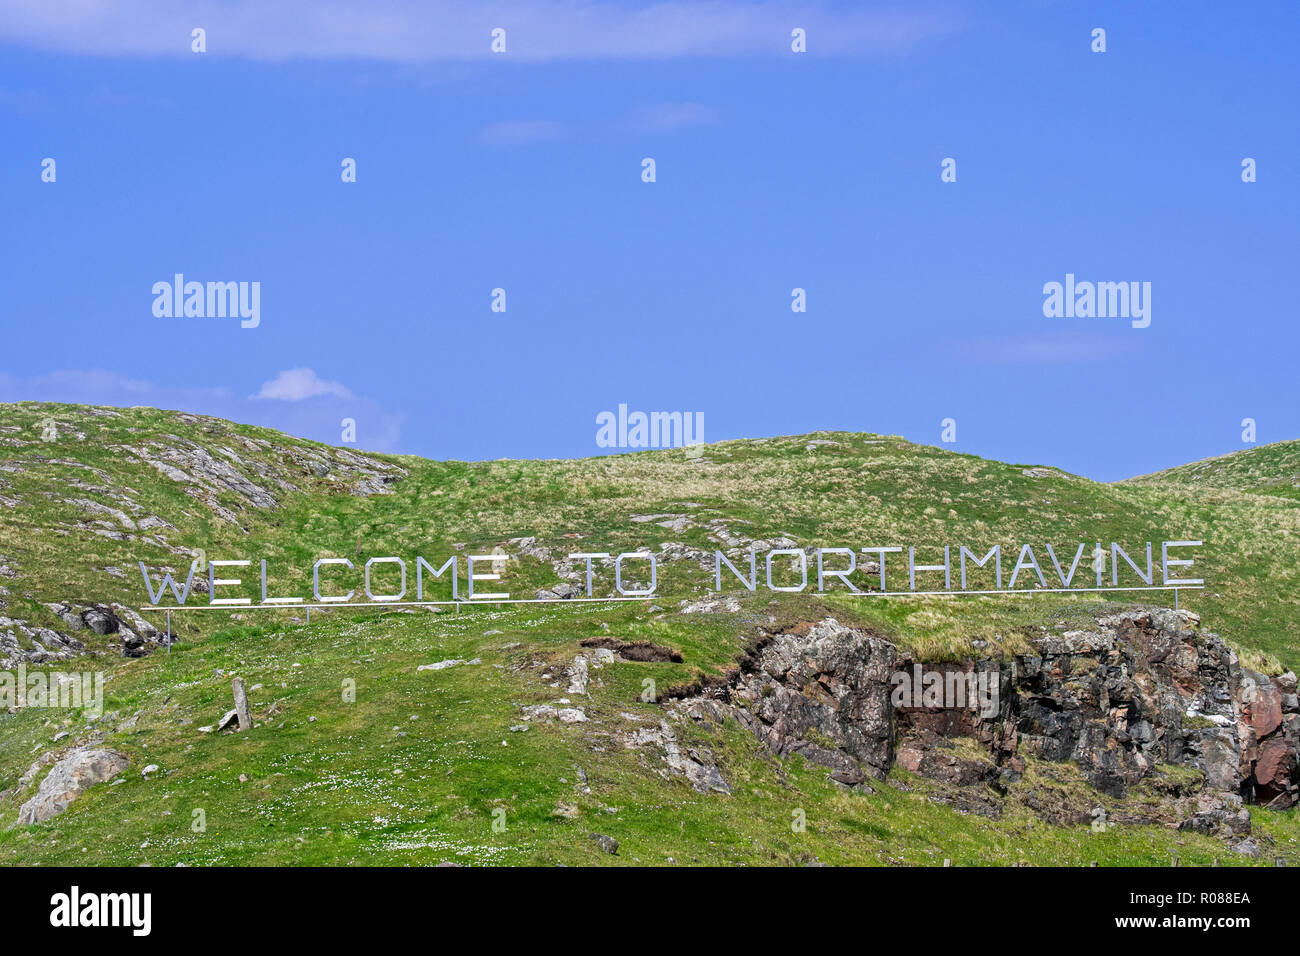 Huge letters of Welcome to Northmavine sign at Mavis Grind in Northmavine, Shetland Isles, Scotland, UK - Stock Image